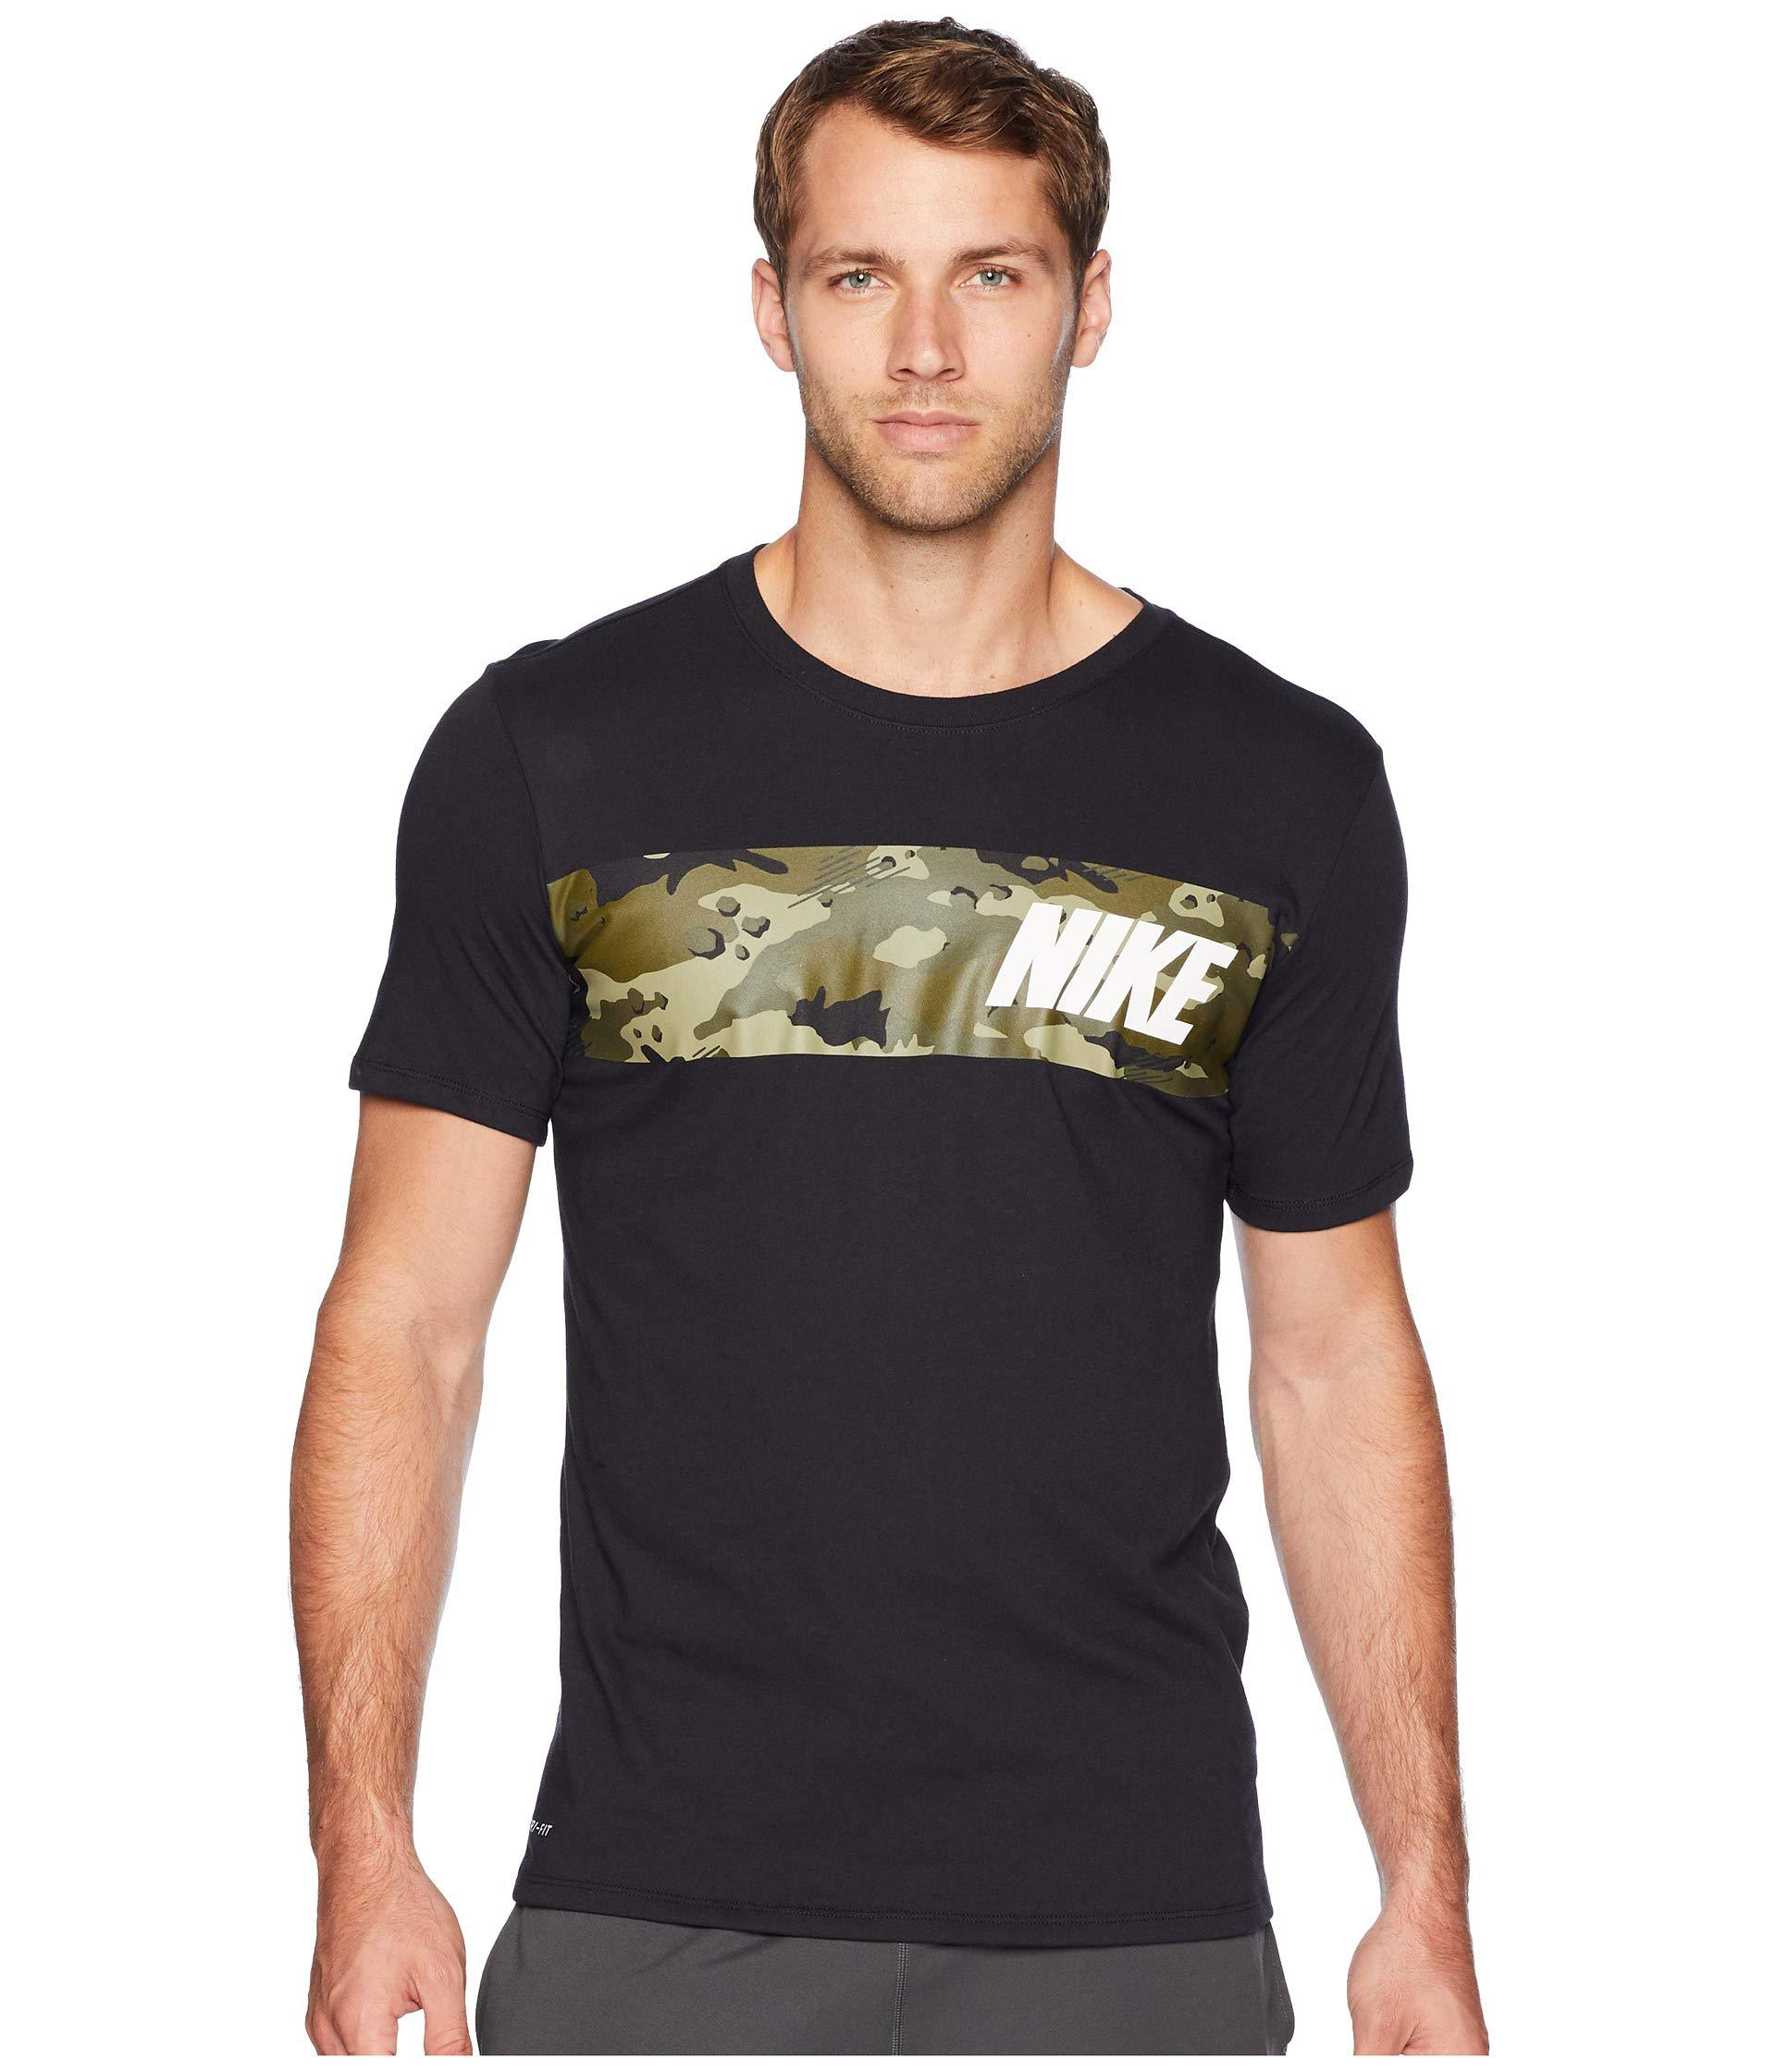 5dff1a49b04e Lyst - Nike Dry Tee Dri-fit Cotton Block Camo in Black for Men